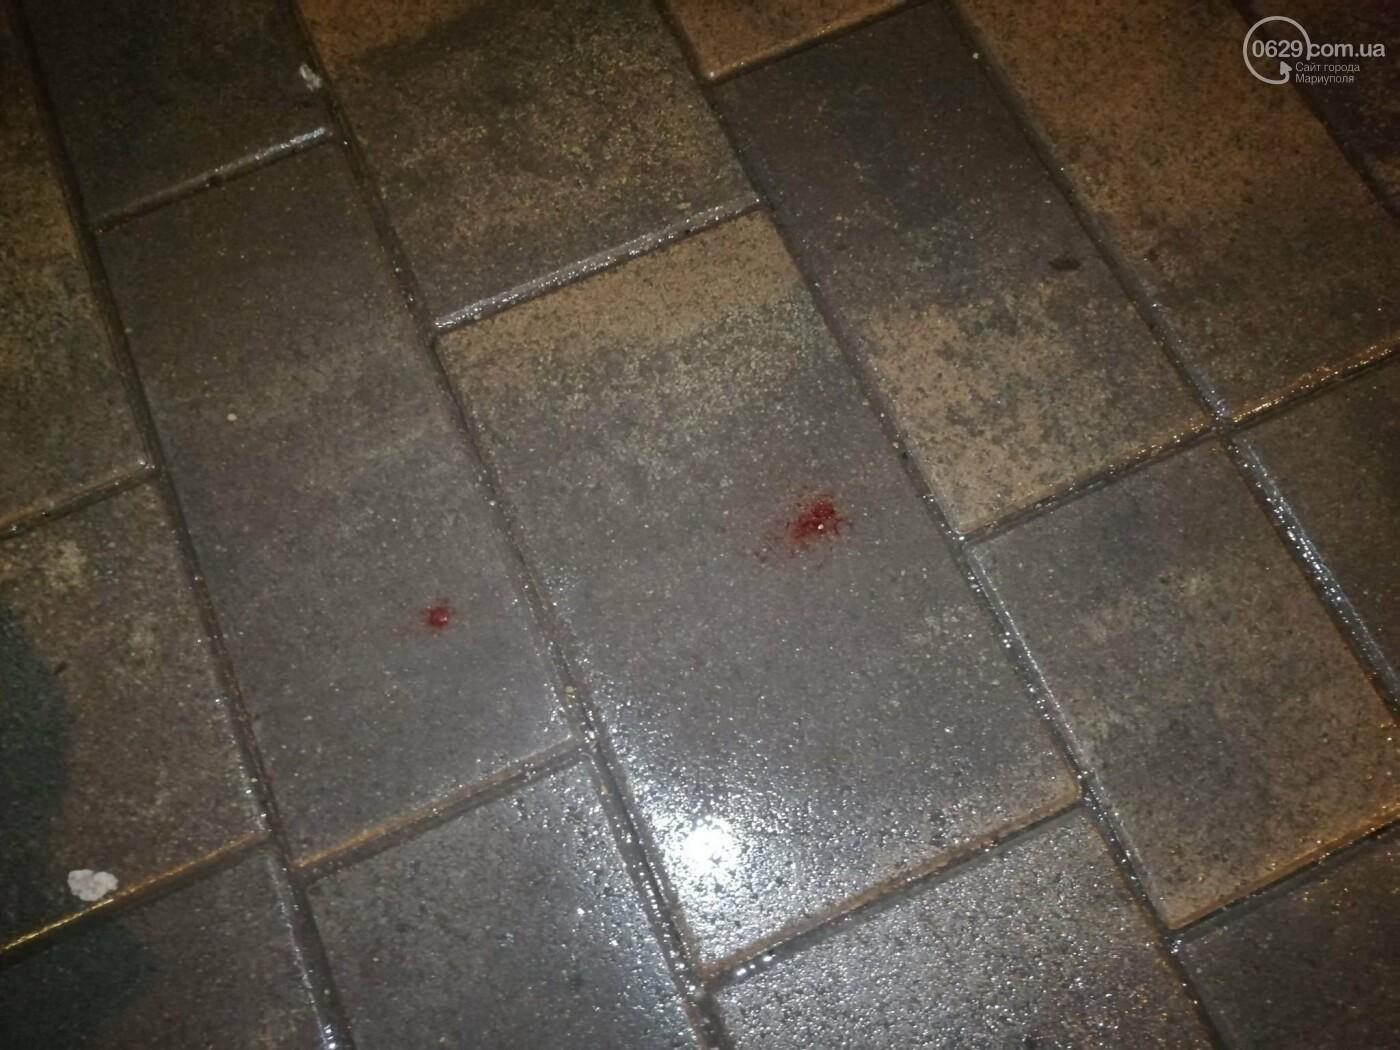 В центре Мариуполя произошла драка,- ФОТО, фото-2